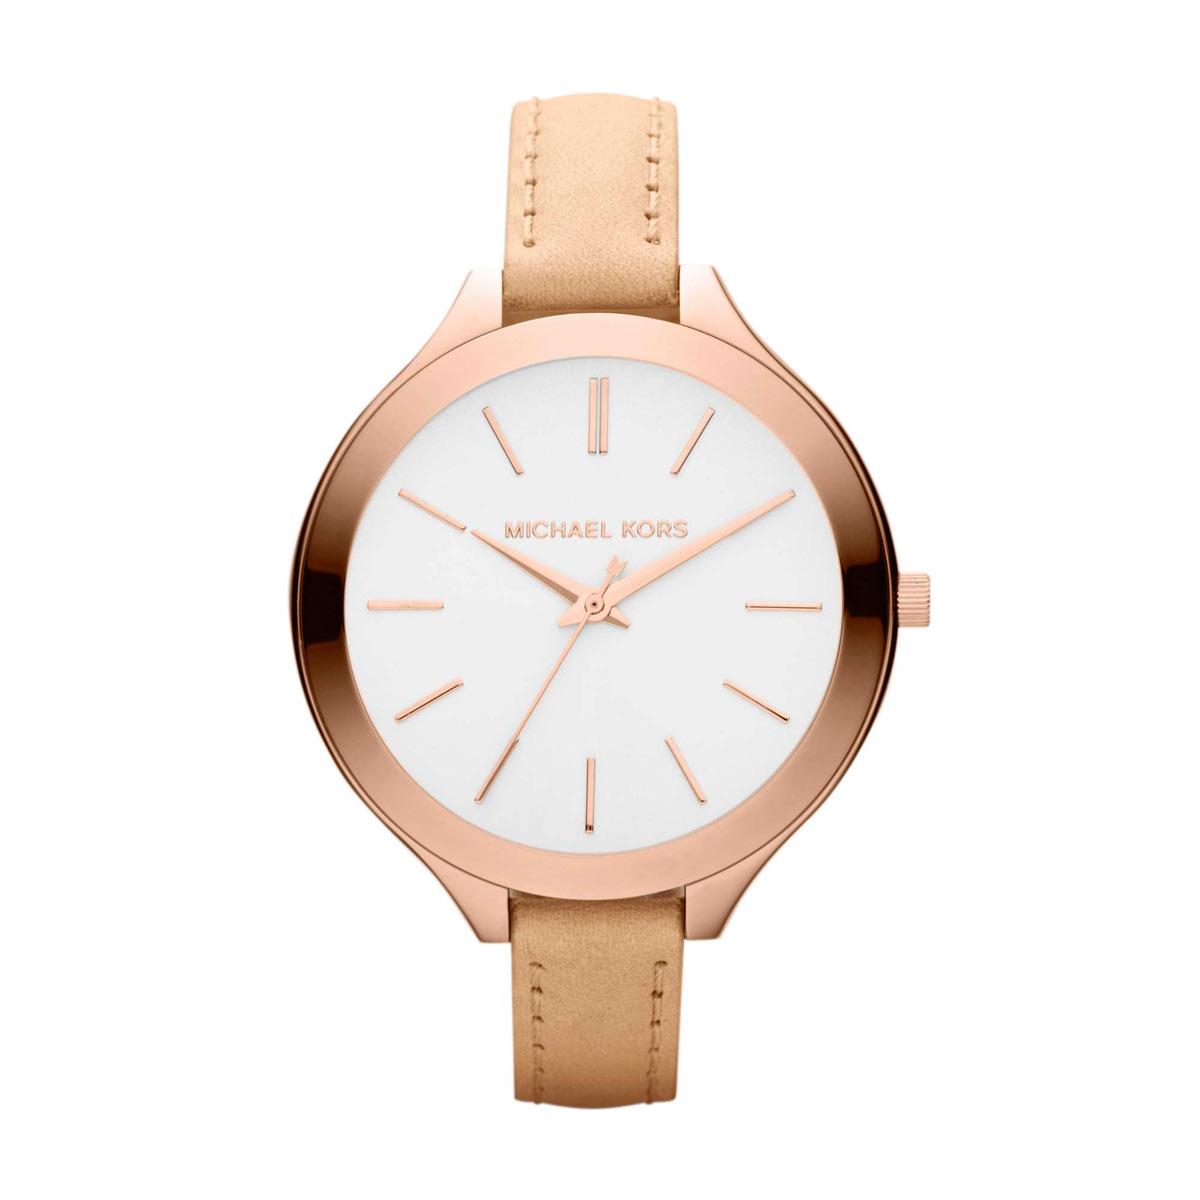 Michael Kors Women's Runway Slim Beige Strap Watch MK2284